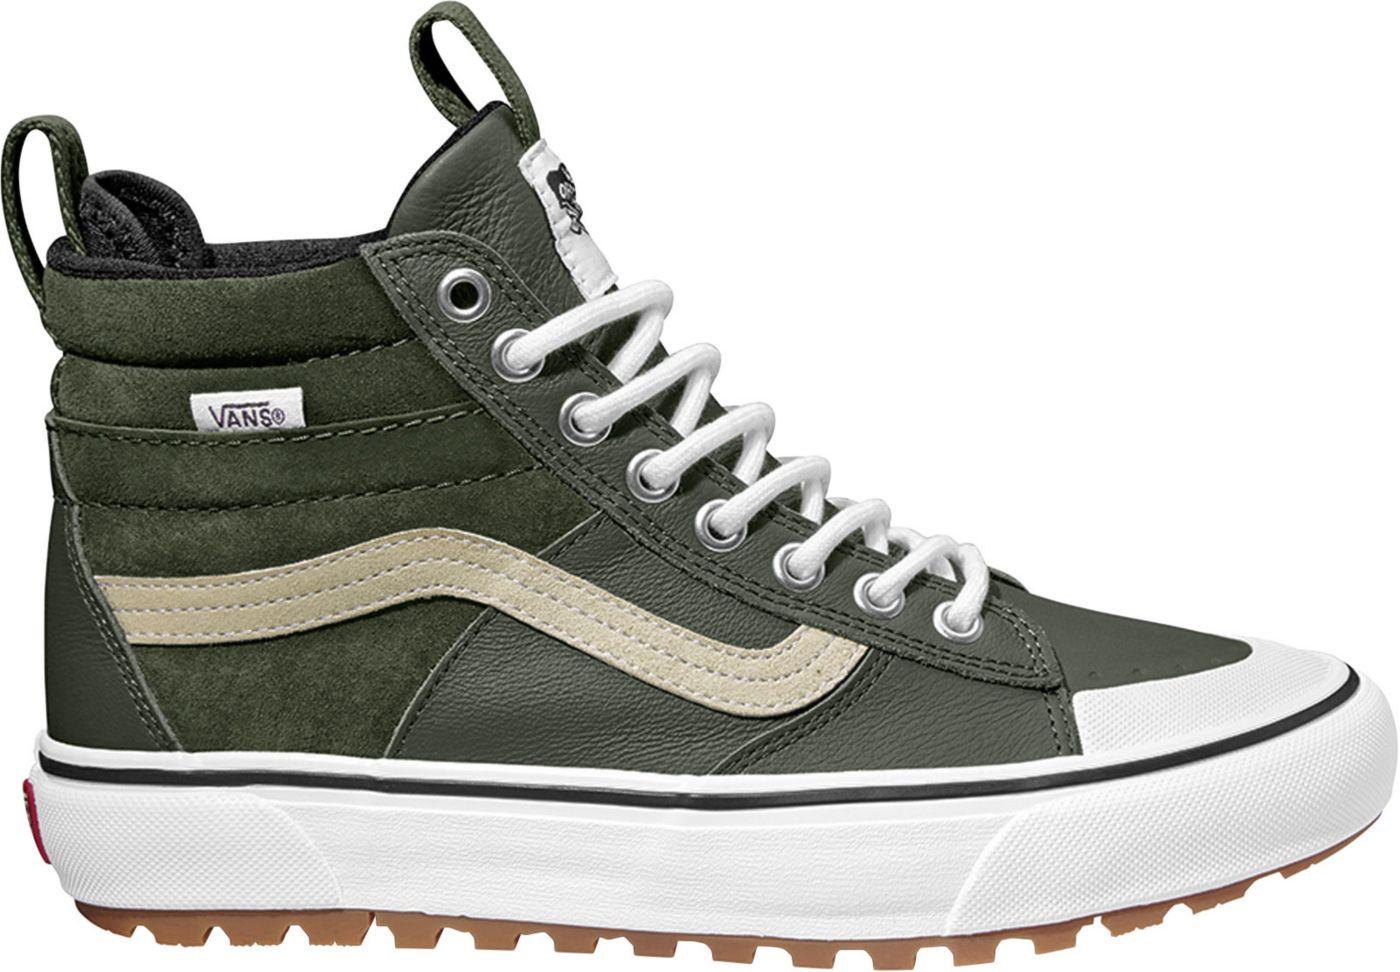 Vans Women's SK8-Hi MTE Shoes